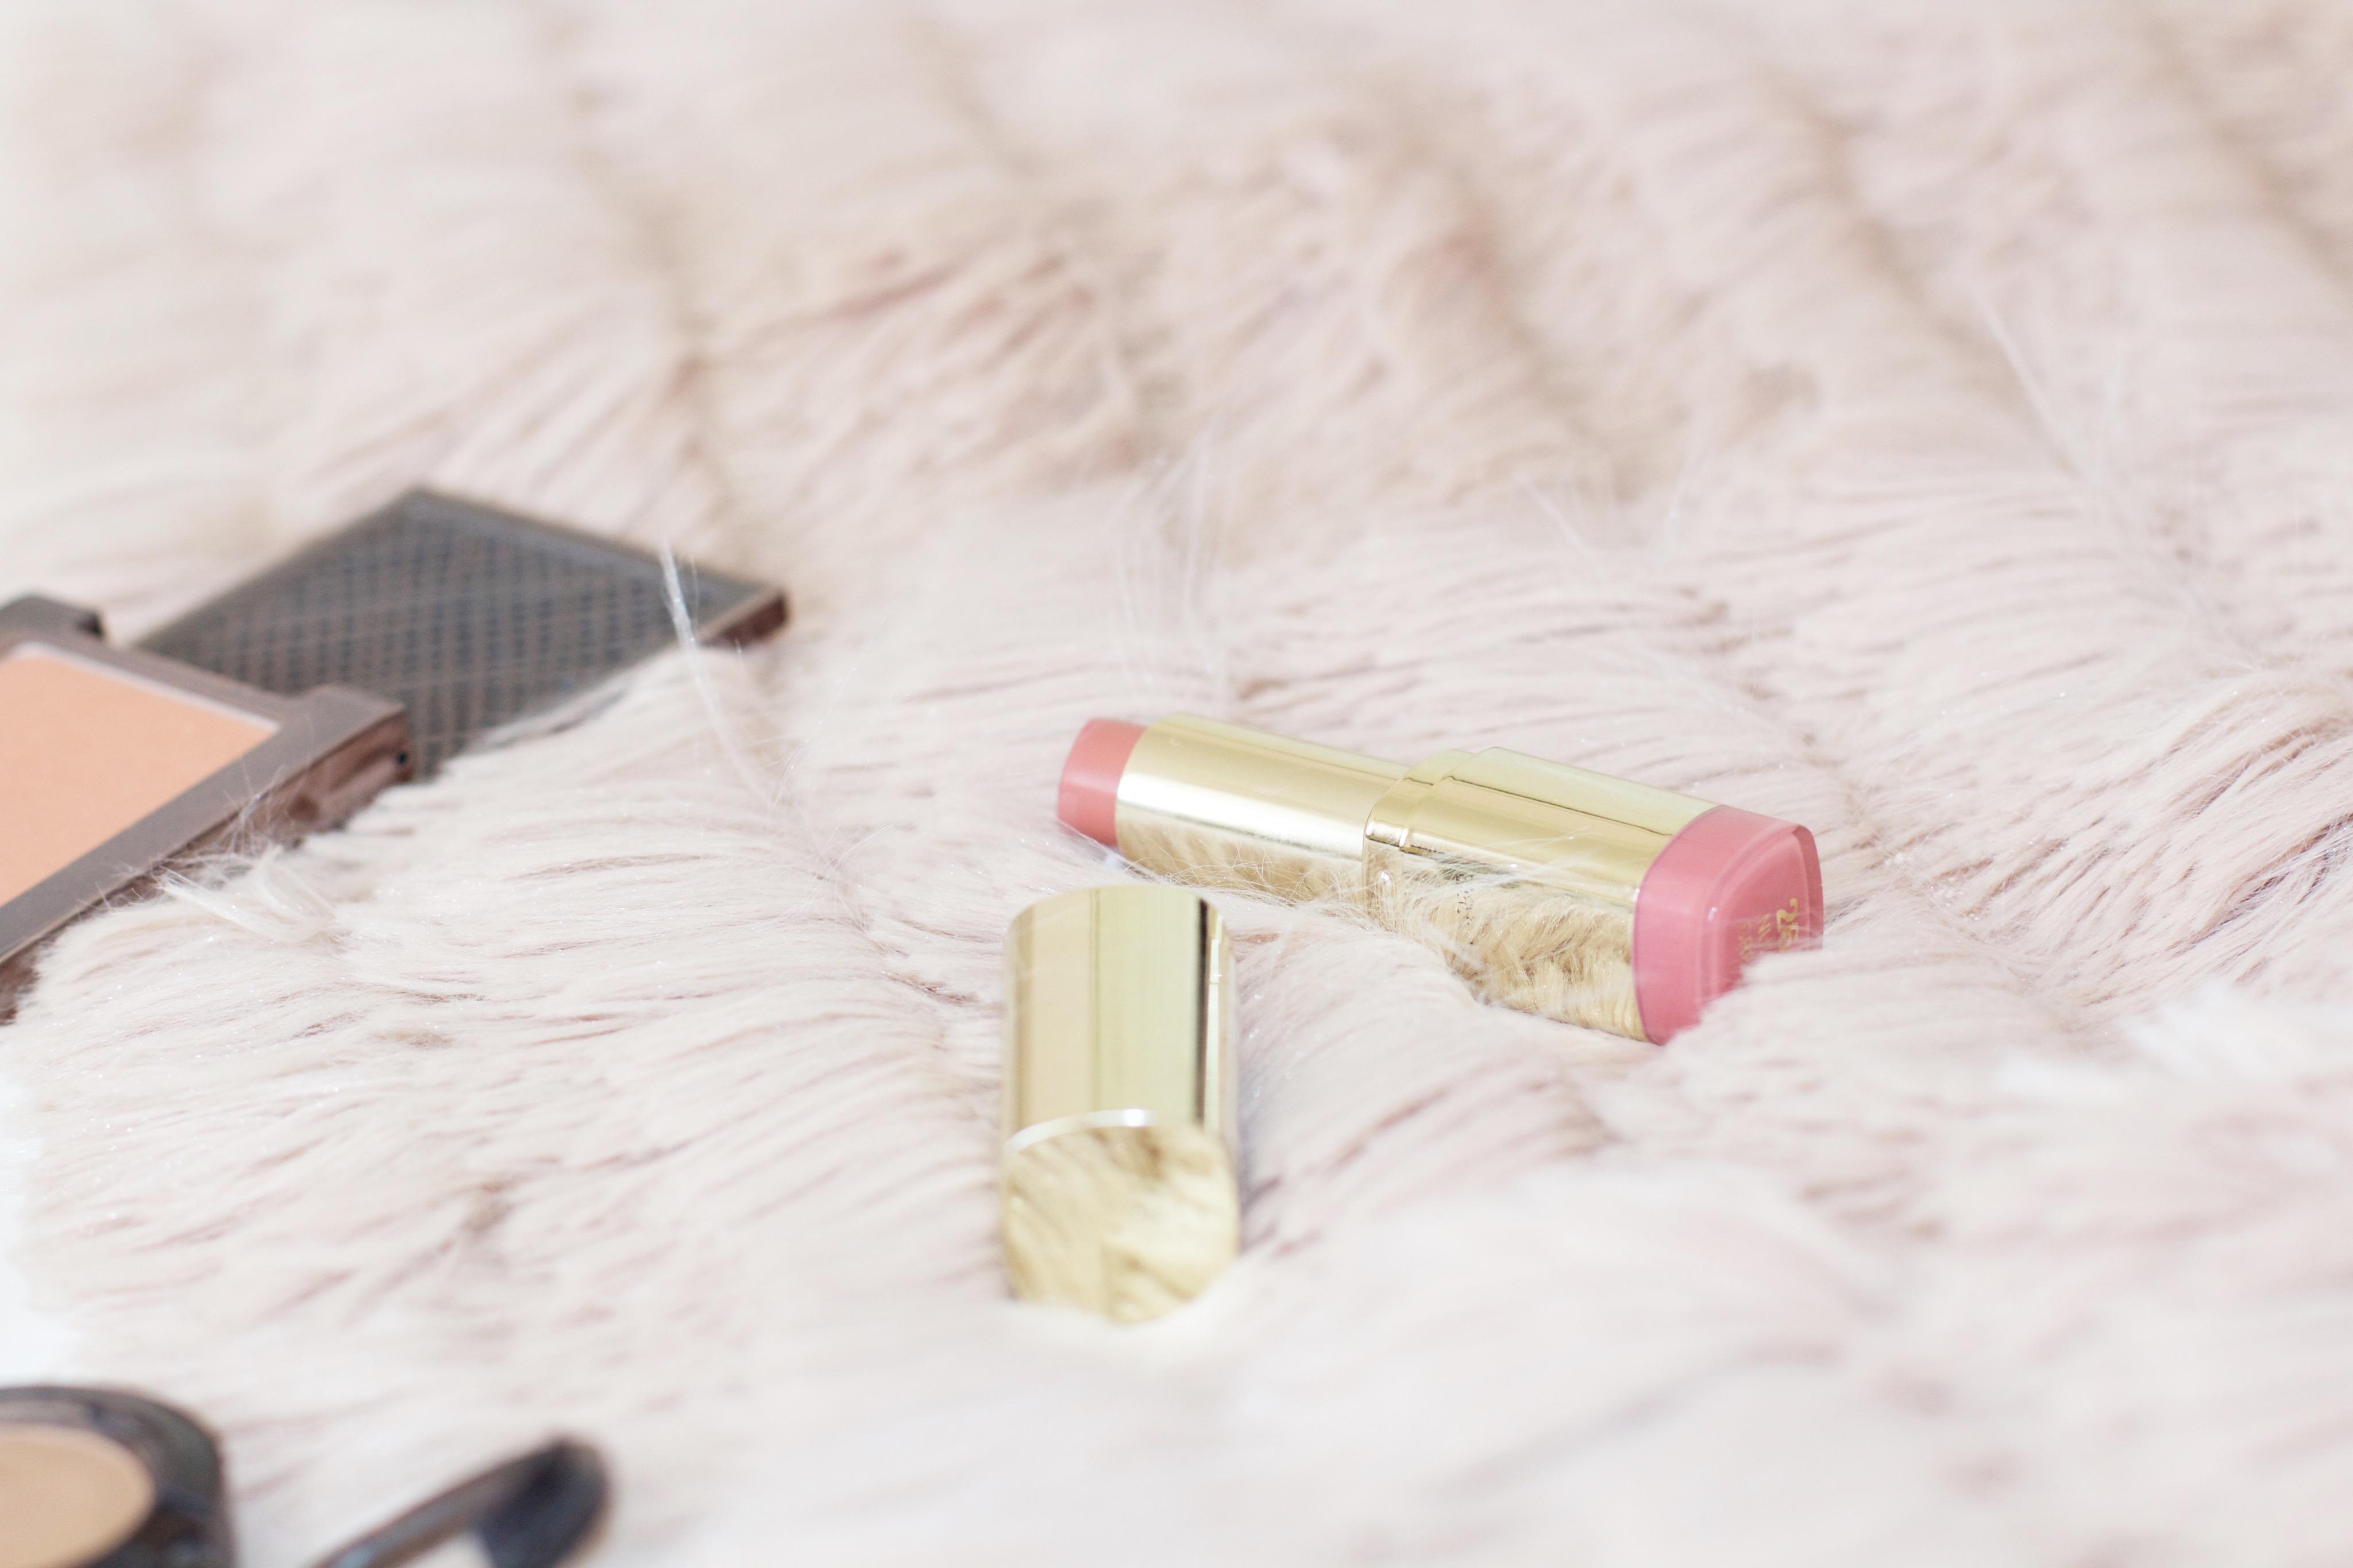 Milani 26 Nude Creme Lipstick - My Styled Life